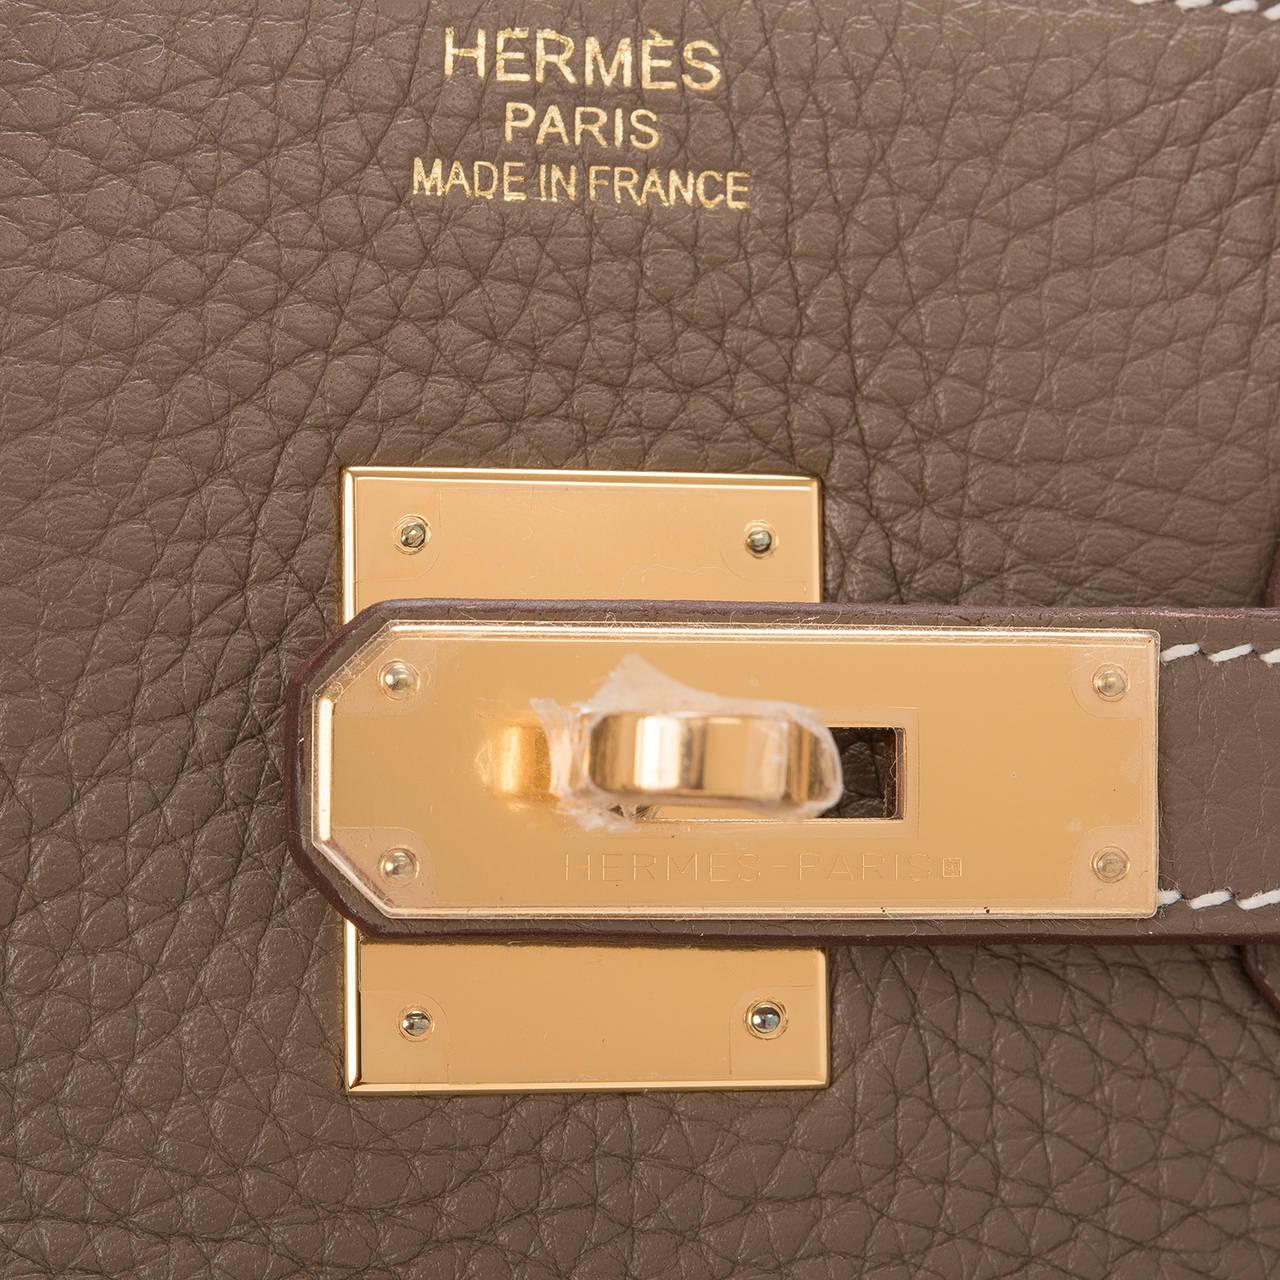 Hermes Etoupe Clemence Leather Birkin 35cm Gold Hardware